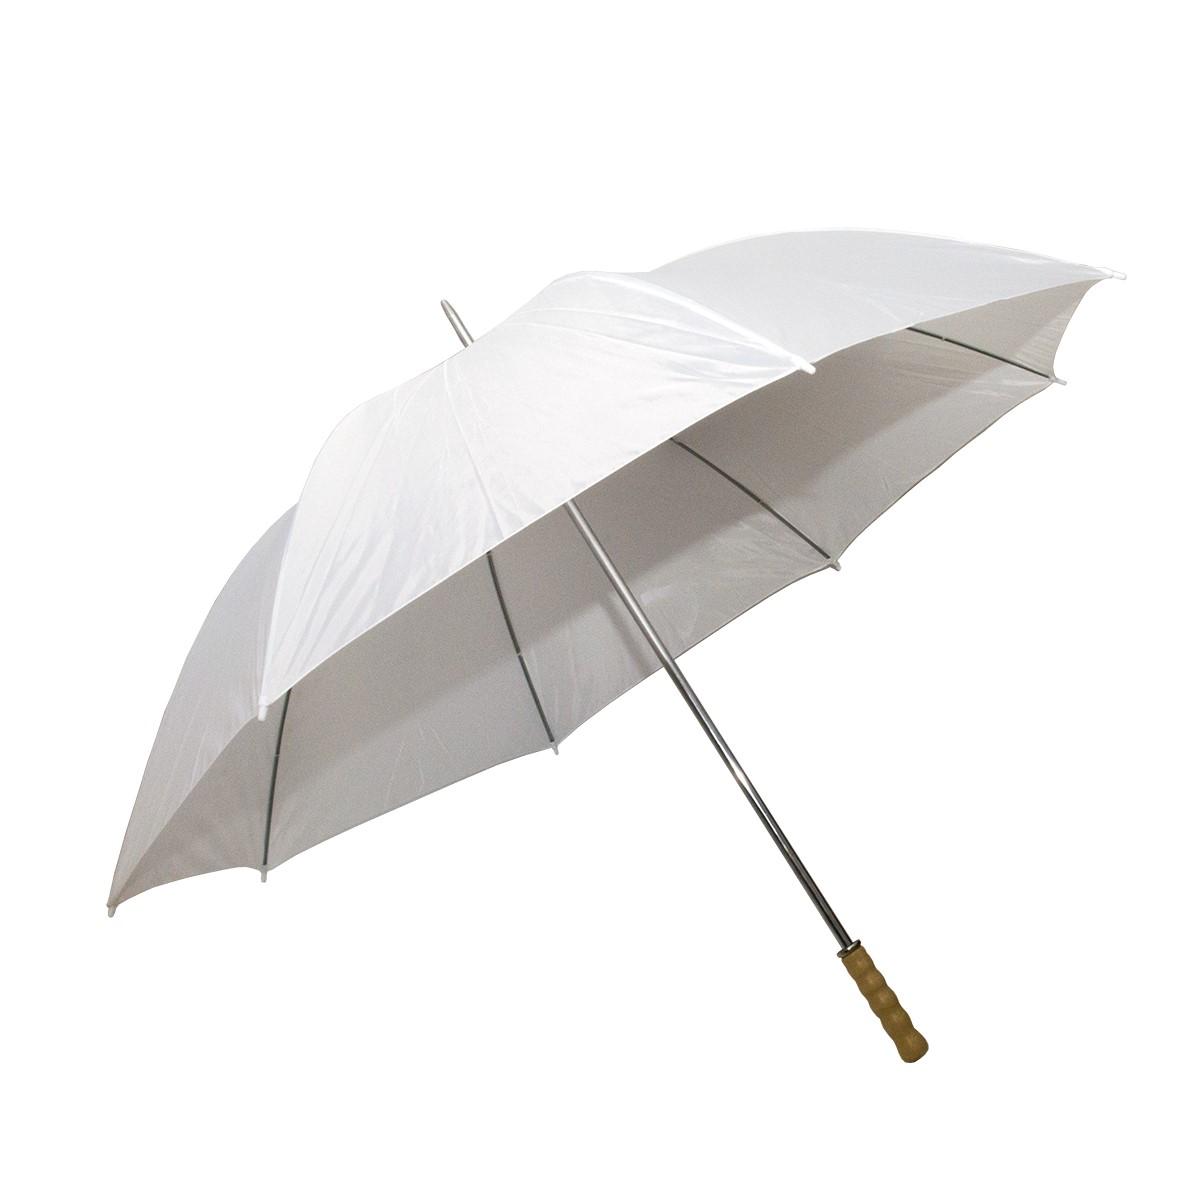 C06-0316 - Paraguas Manual con mango de Madera